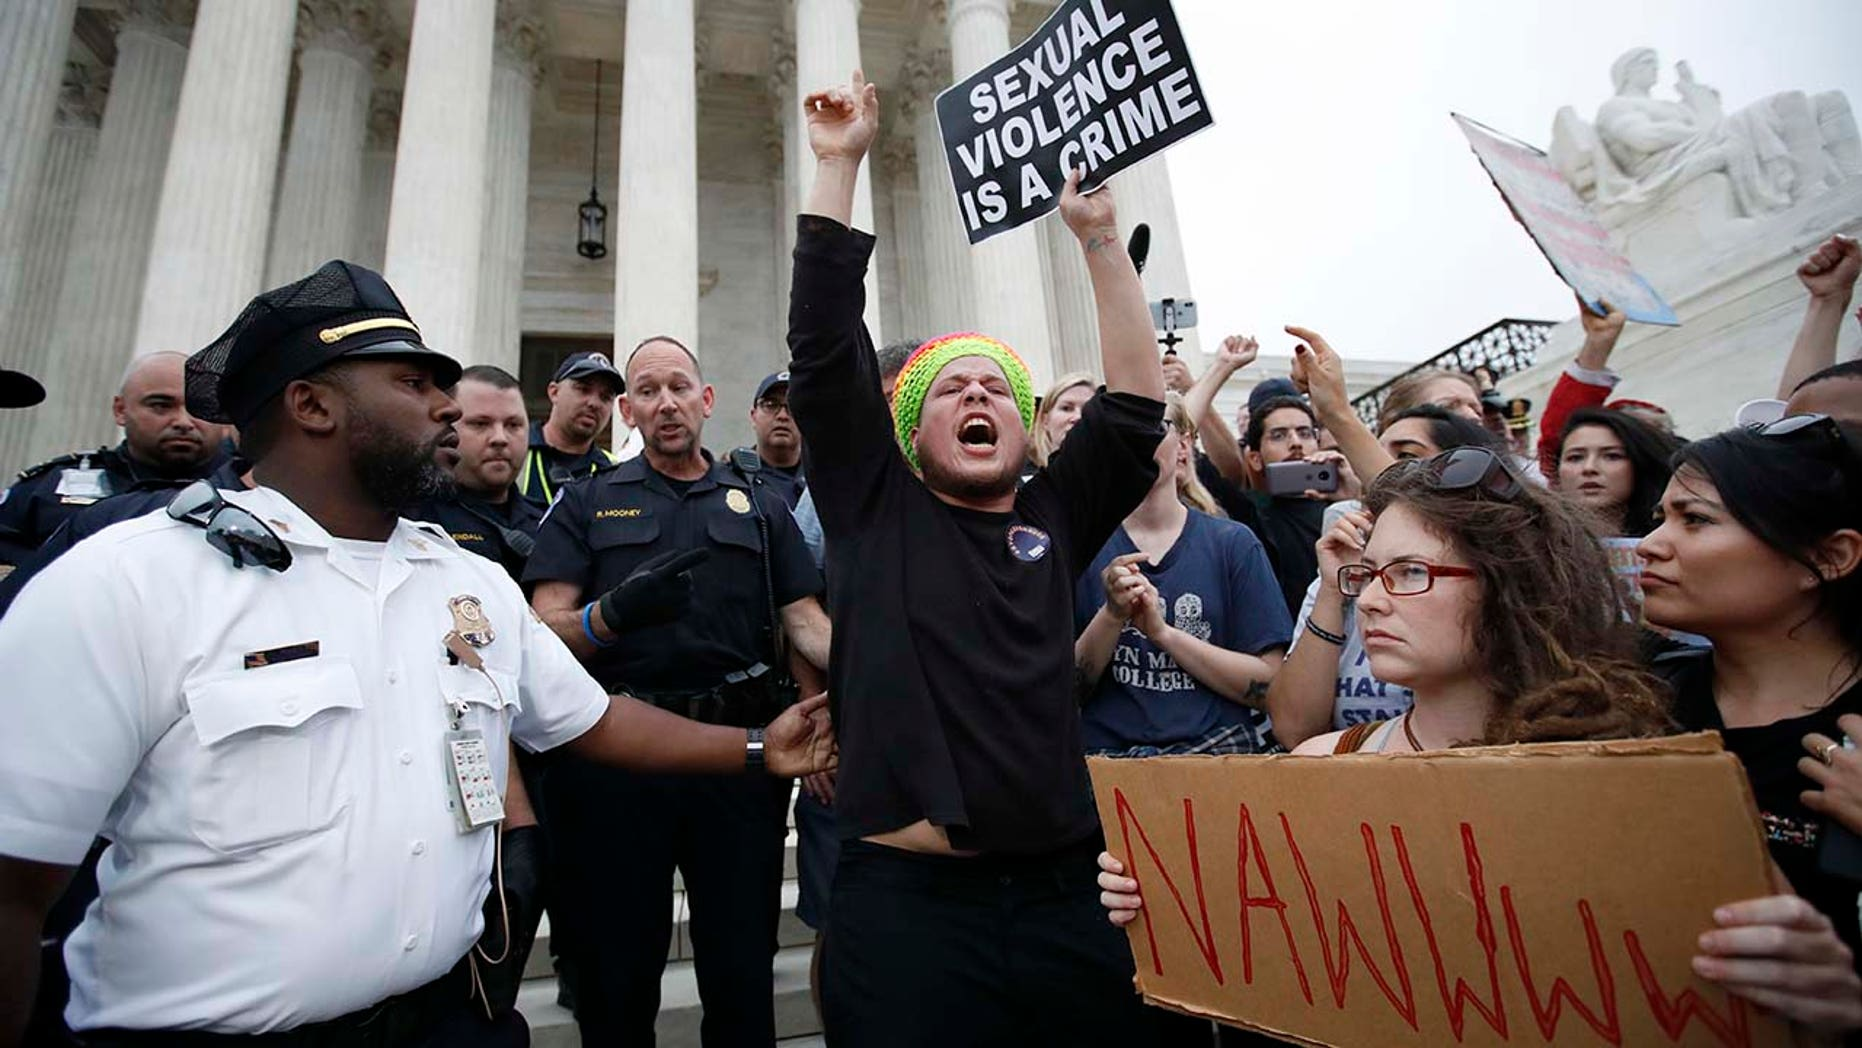 Demonstrators at the Supreme Court protest the Senate confirmation of new Justice Brett Kavanaugh (AP Photo/Alex Brandon)